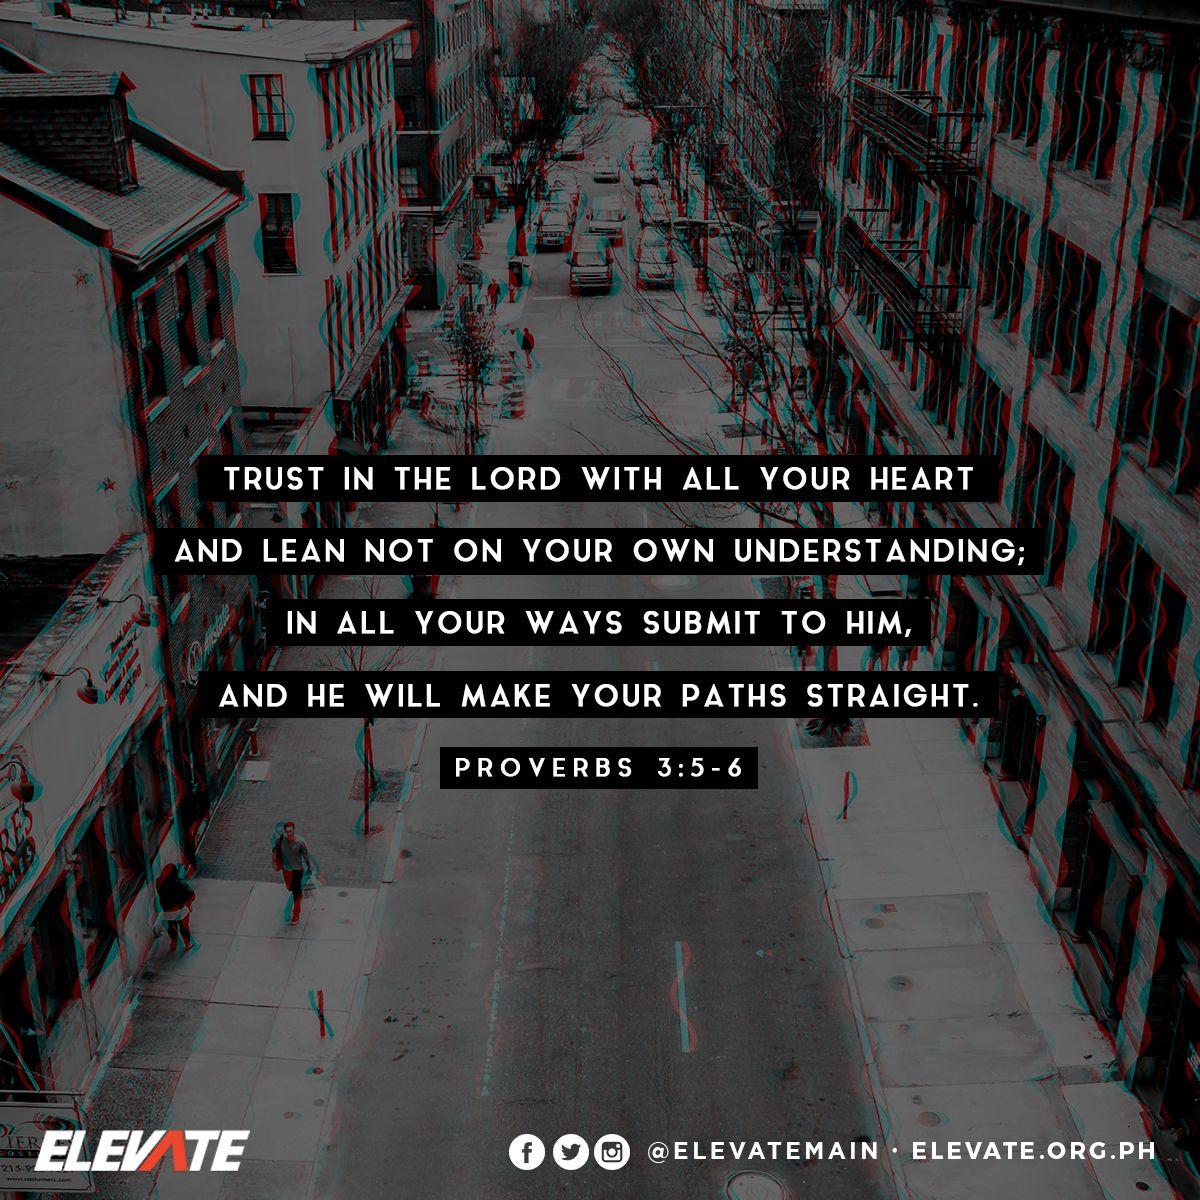 Remember, trusting God always works! #ElevateMain #ElevateSamson